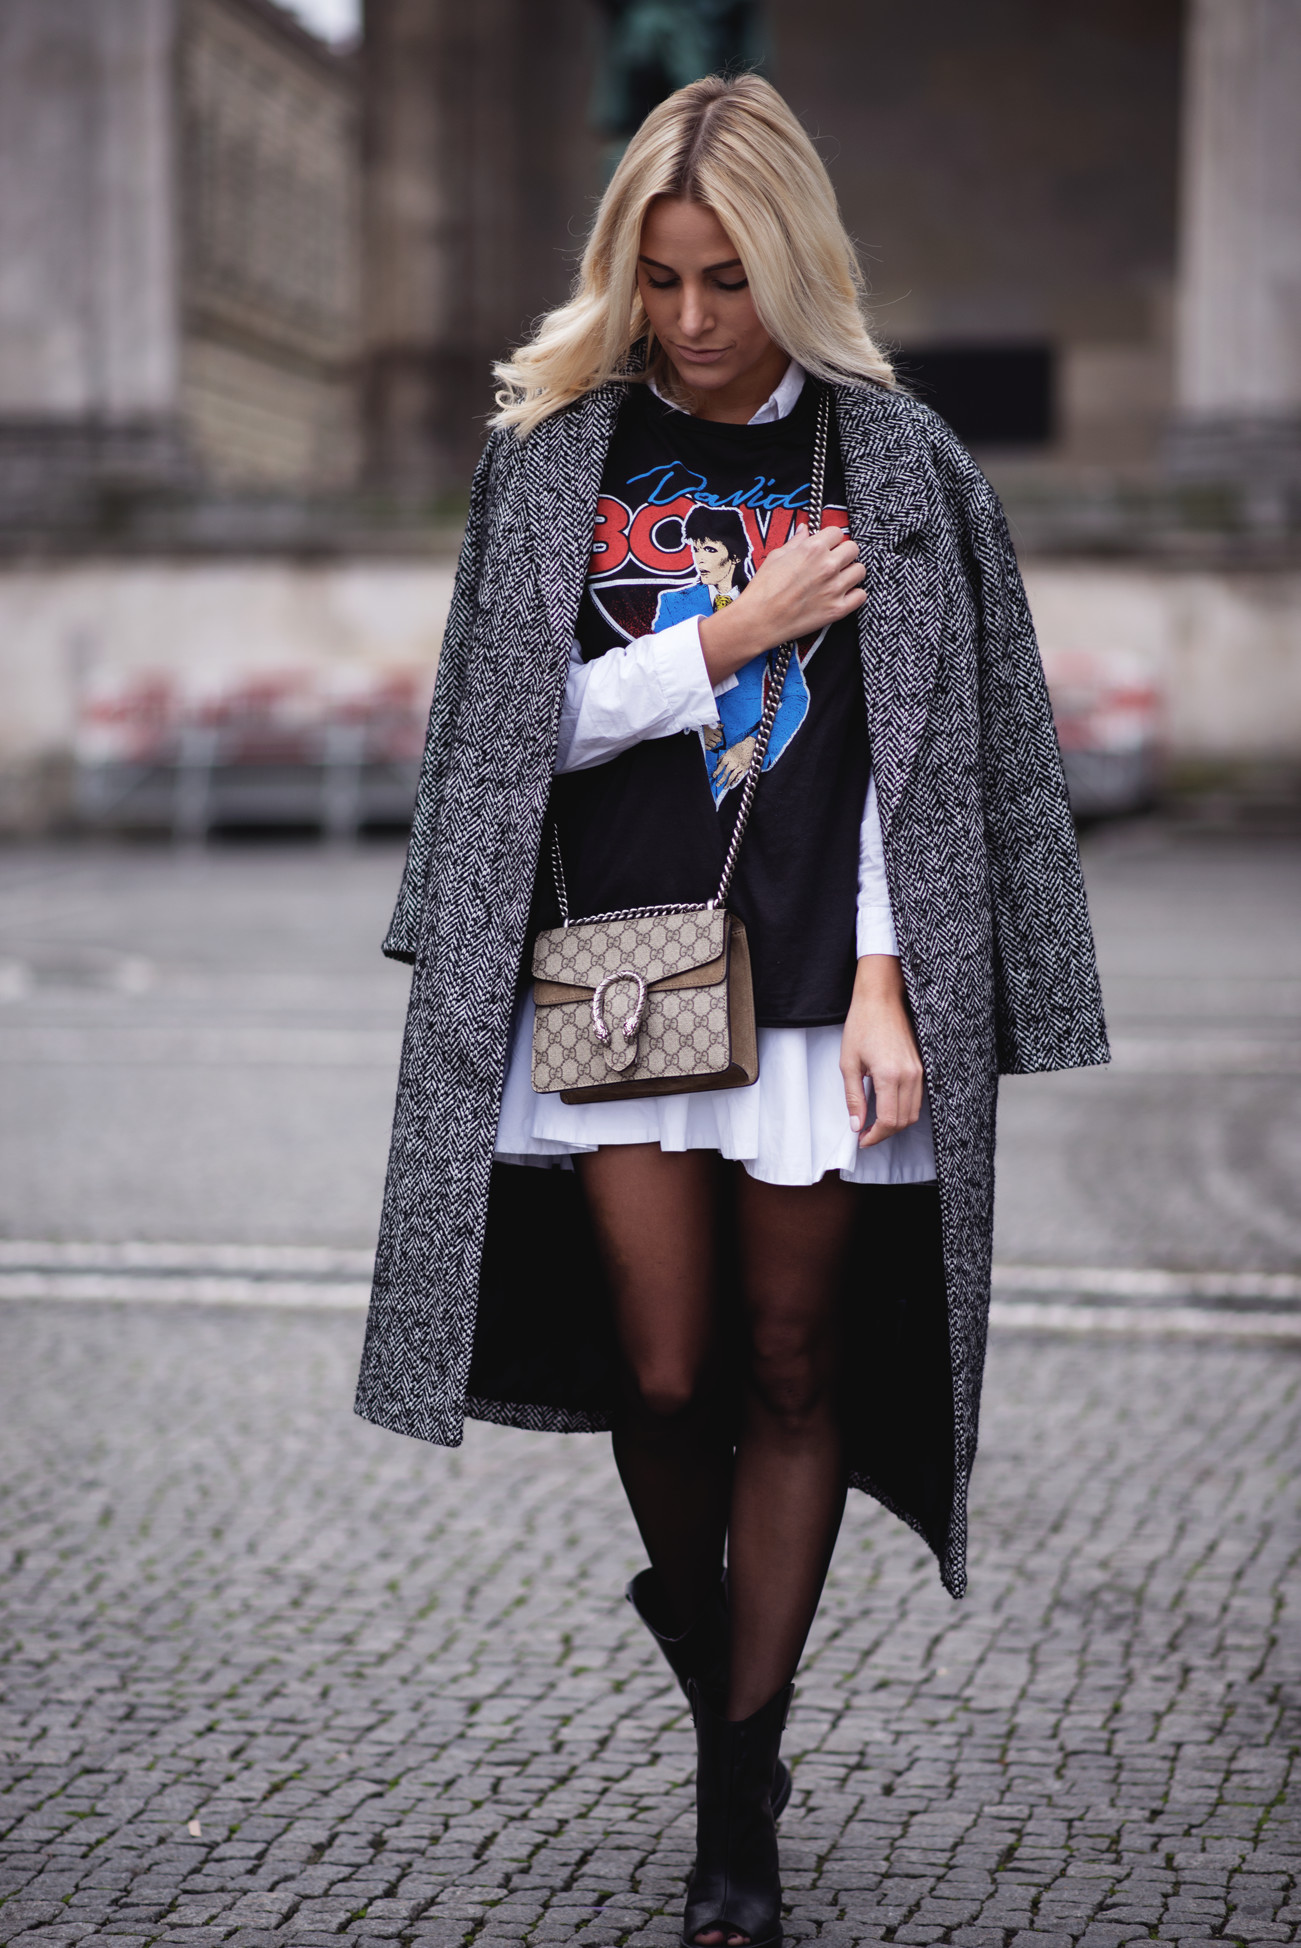 davidbowie-bandshirt-guccidionysus-fashion-fashionblogger-munich-sequinsophia-2-dsc_3703